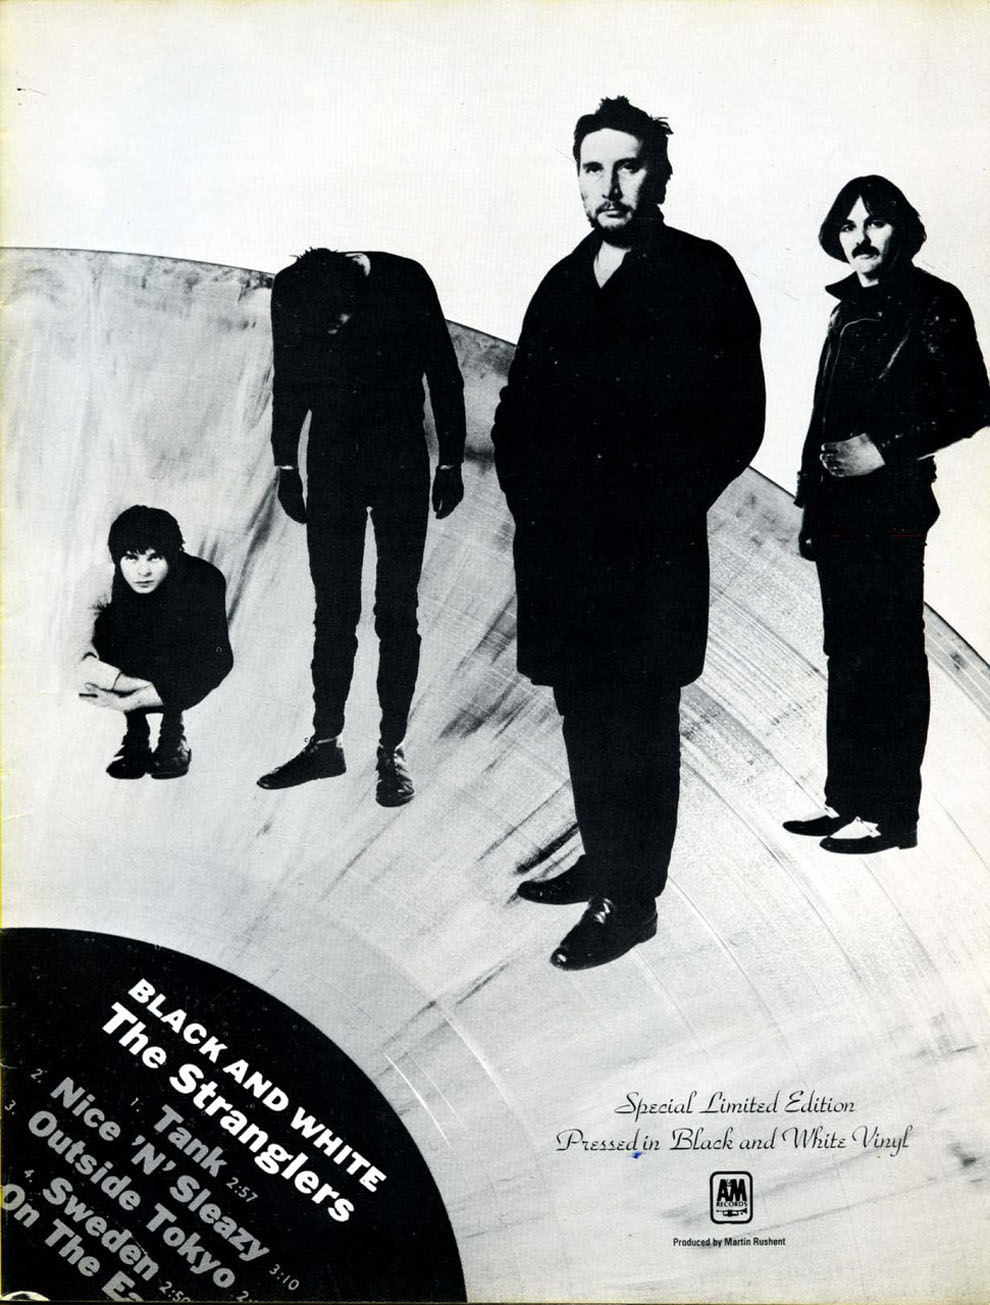 The Stranglers - Black & White Vinyl - Searching For The